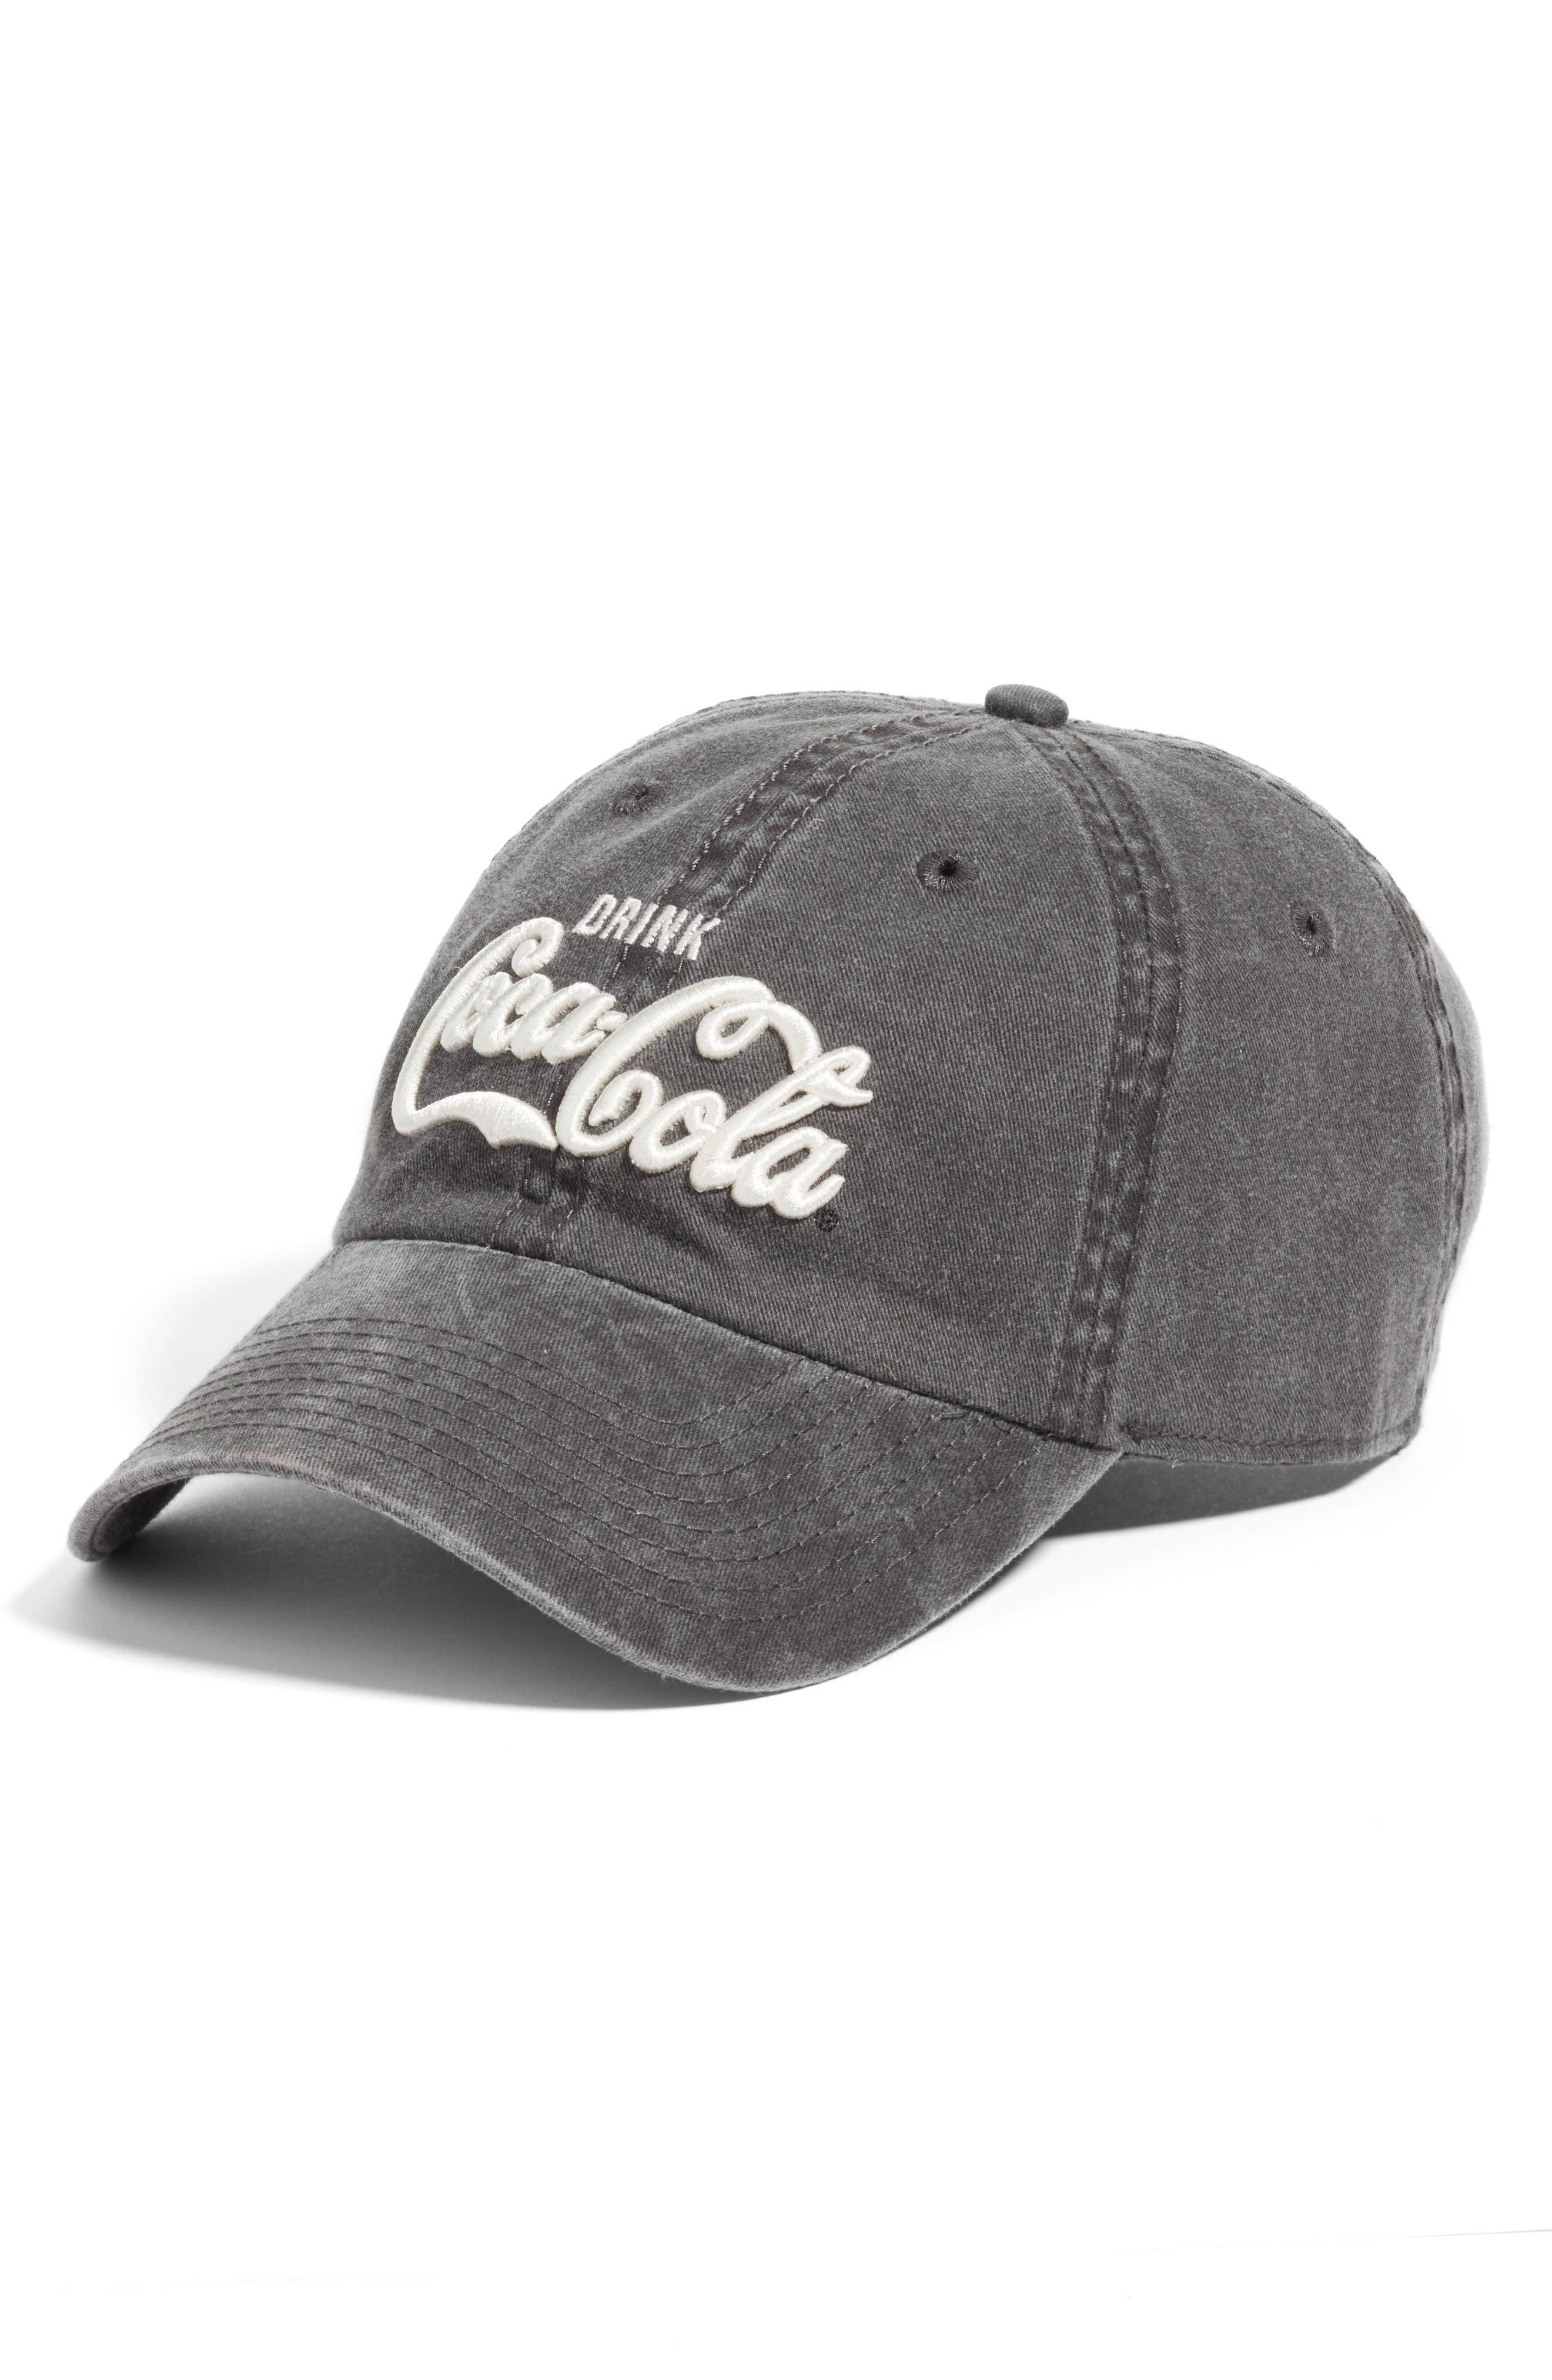 American Needle New Raglan - Coca-Cola Baseball Cap